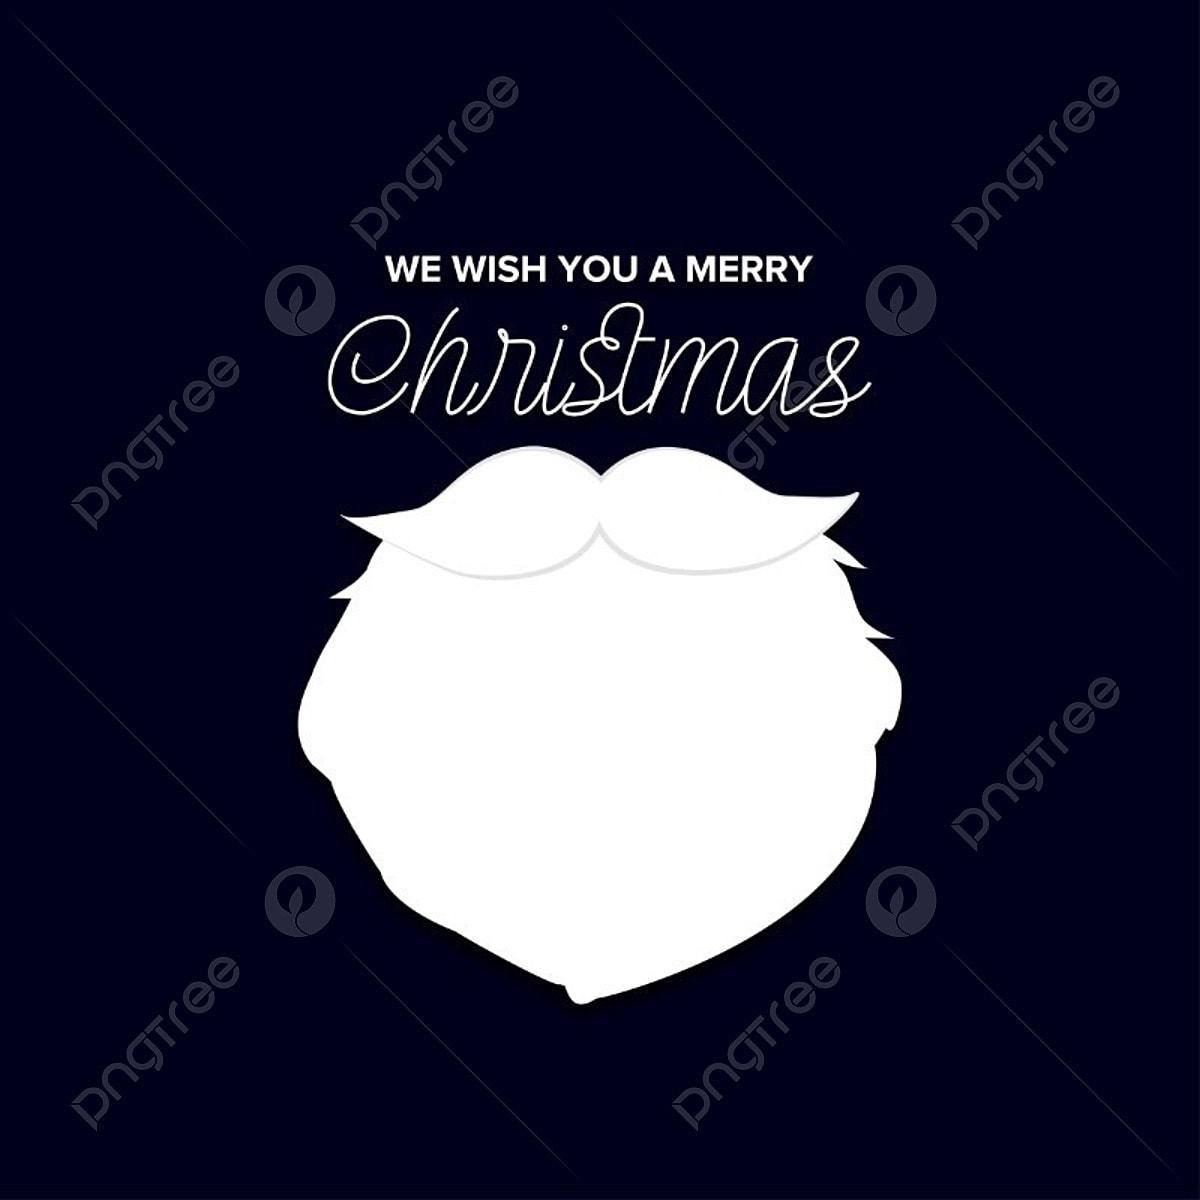 Joyeux Noël Avec Noir Et Blanc Vecteur Noël Carte Bleu